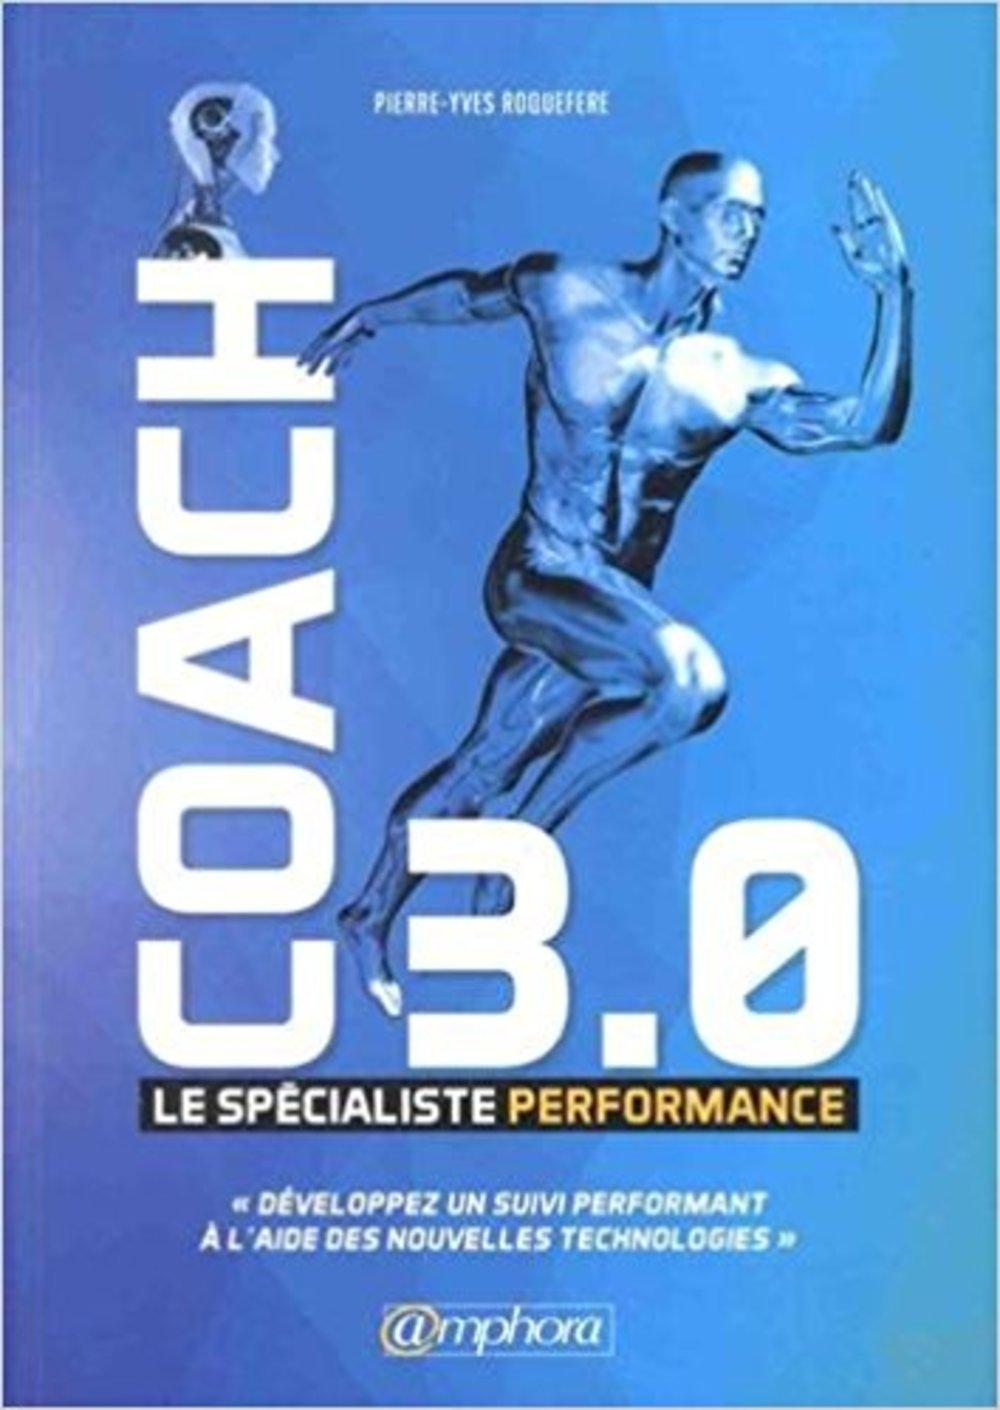 Coach 3.0 Le Specialiste Performance